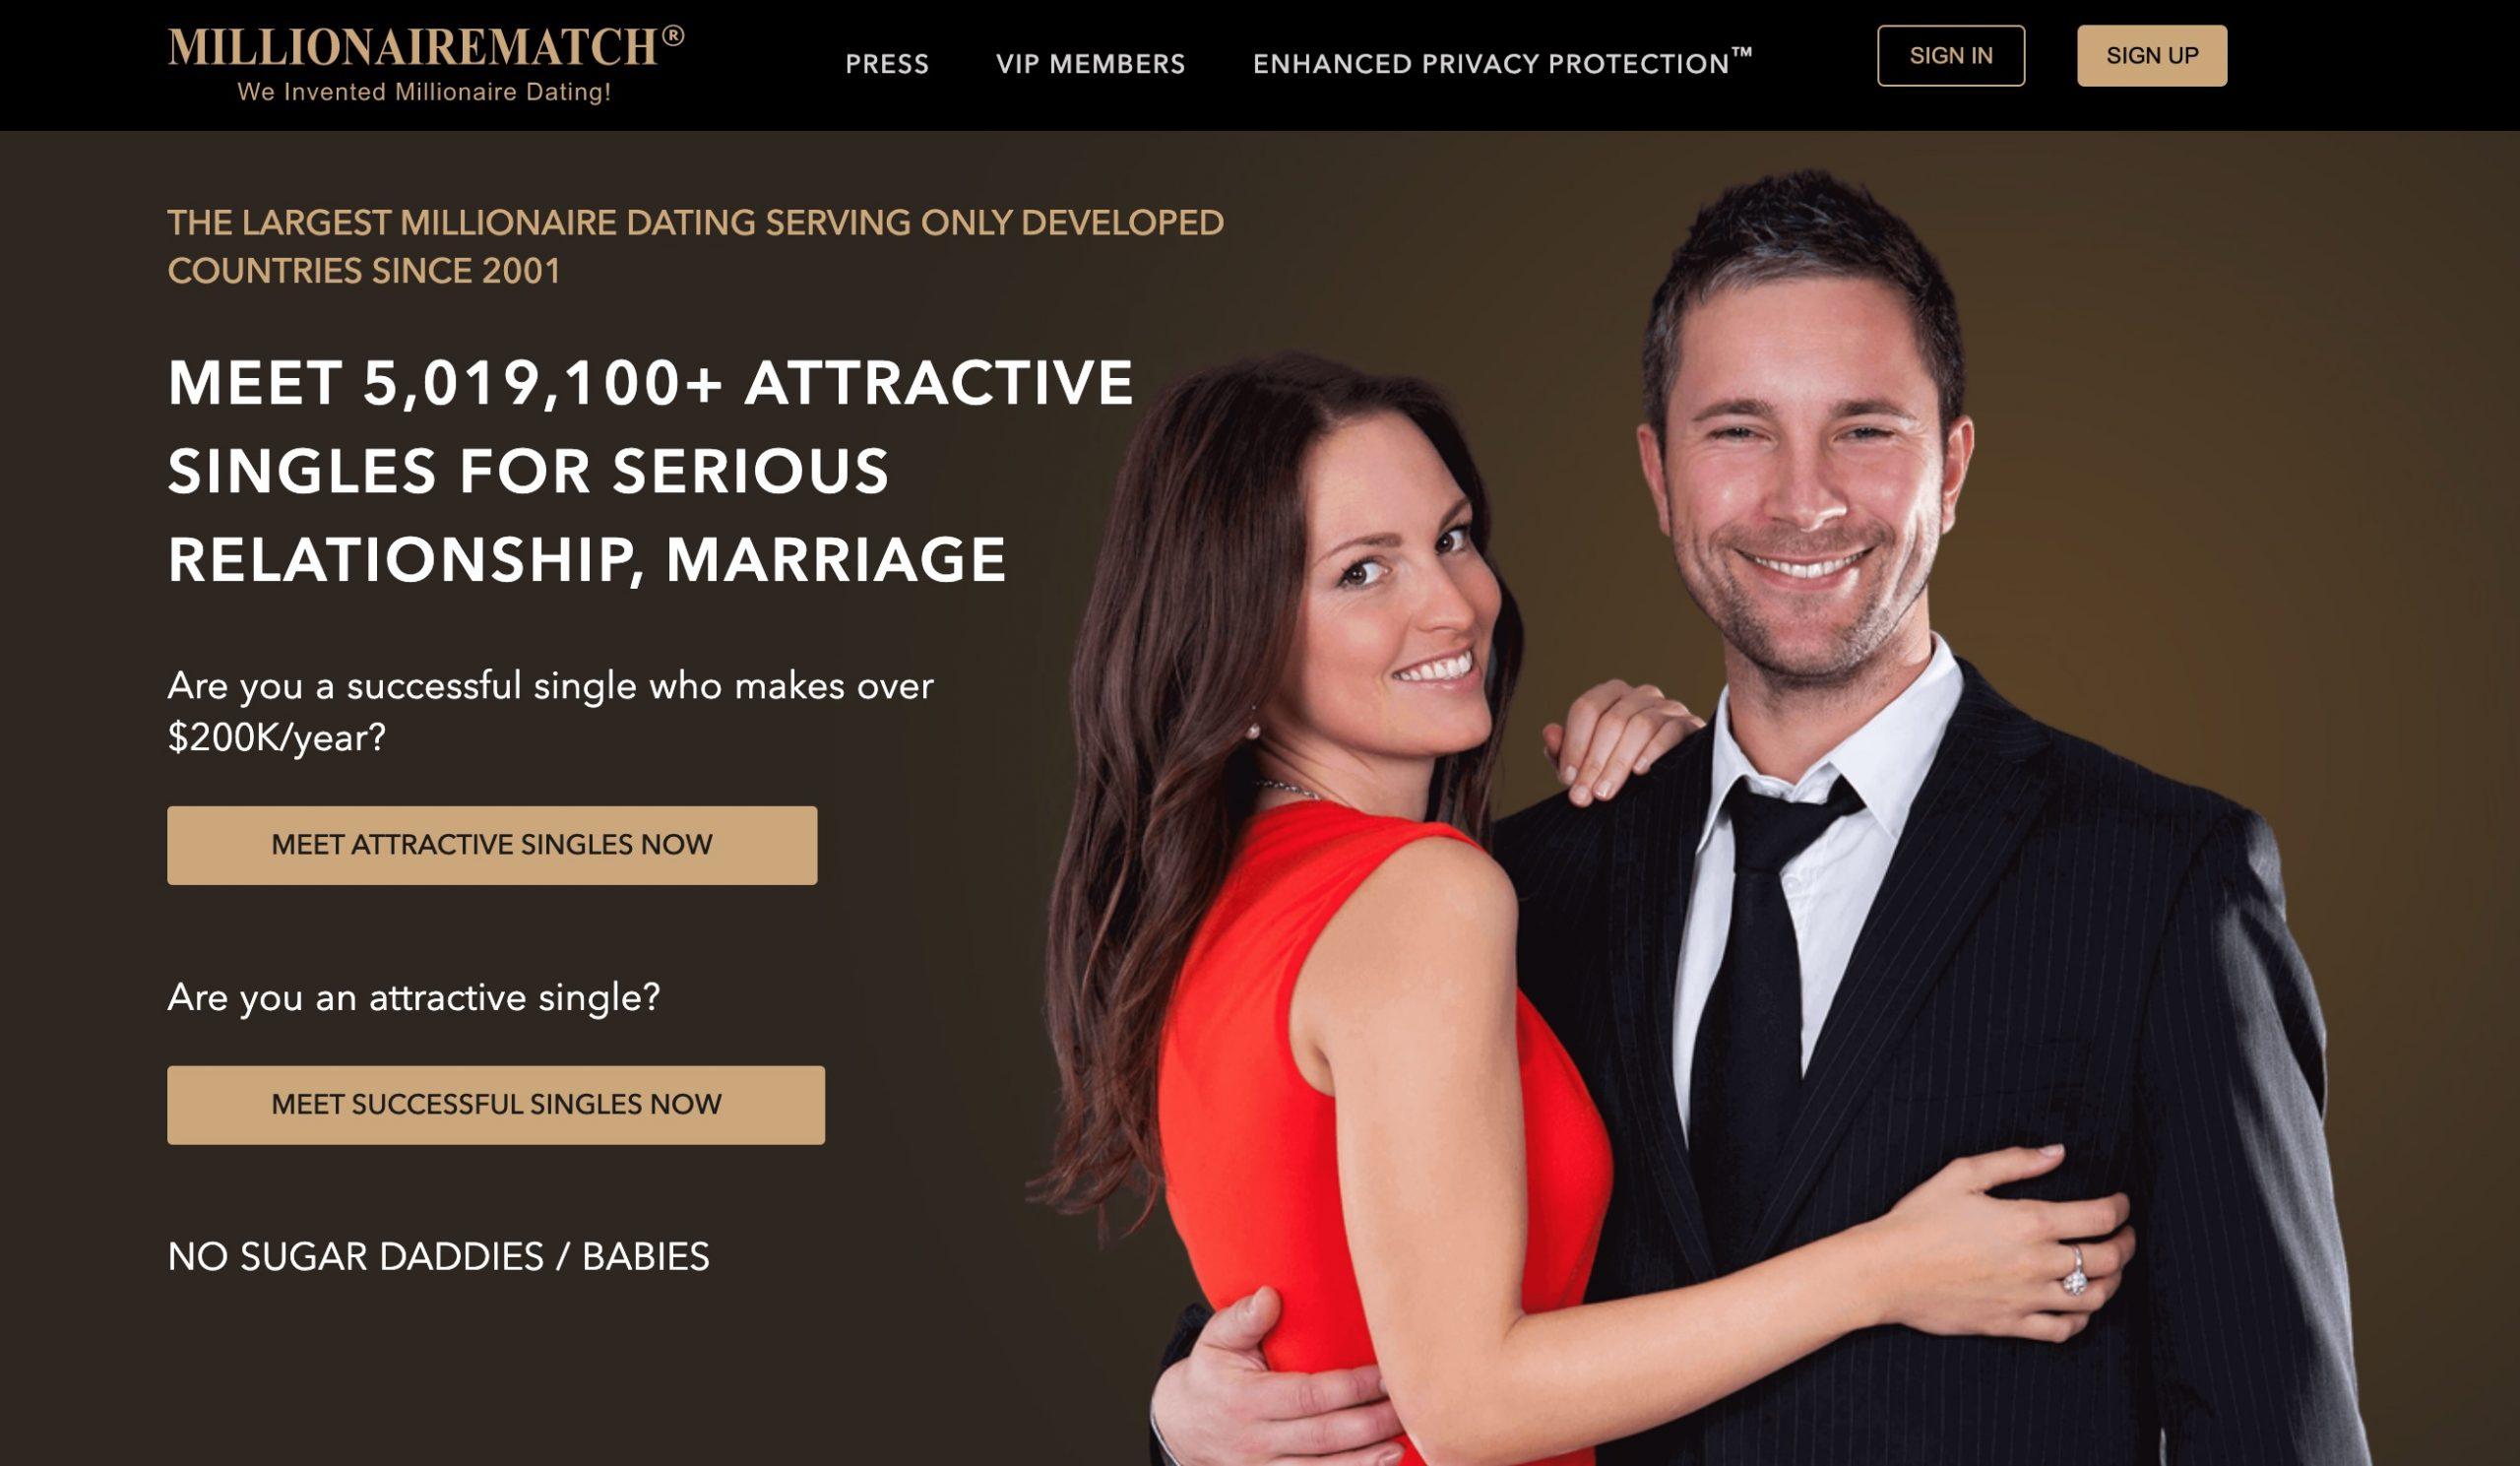 Millionairematch main page